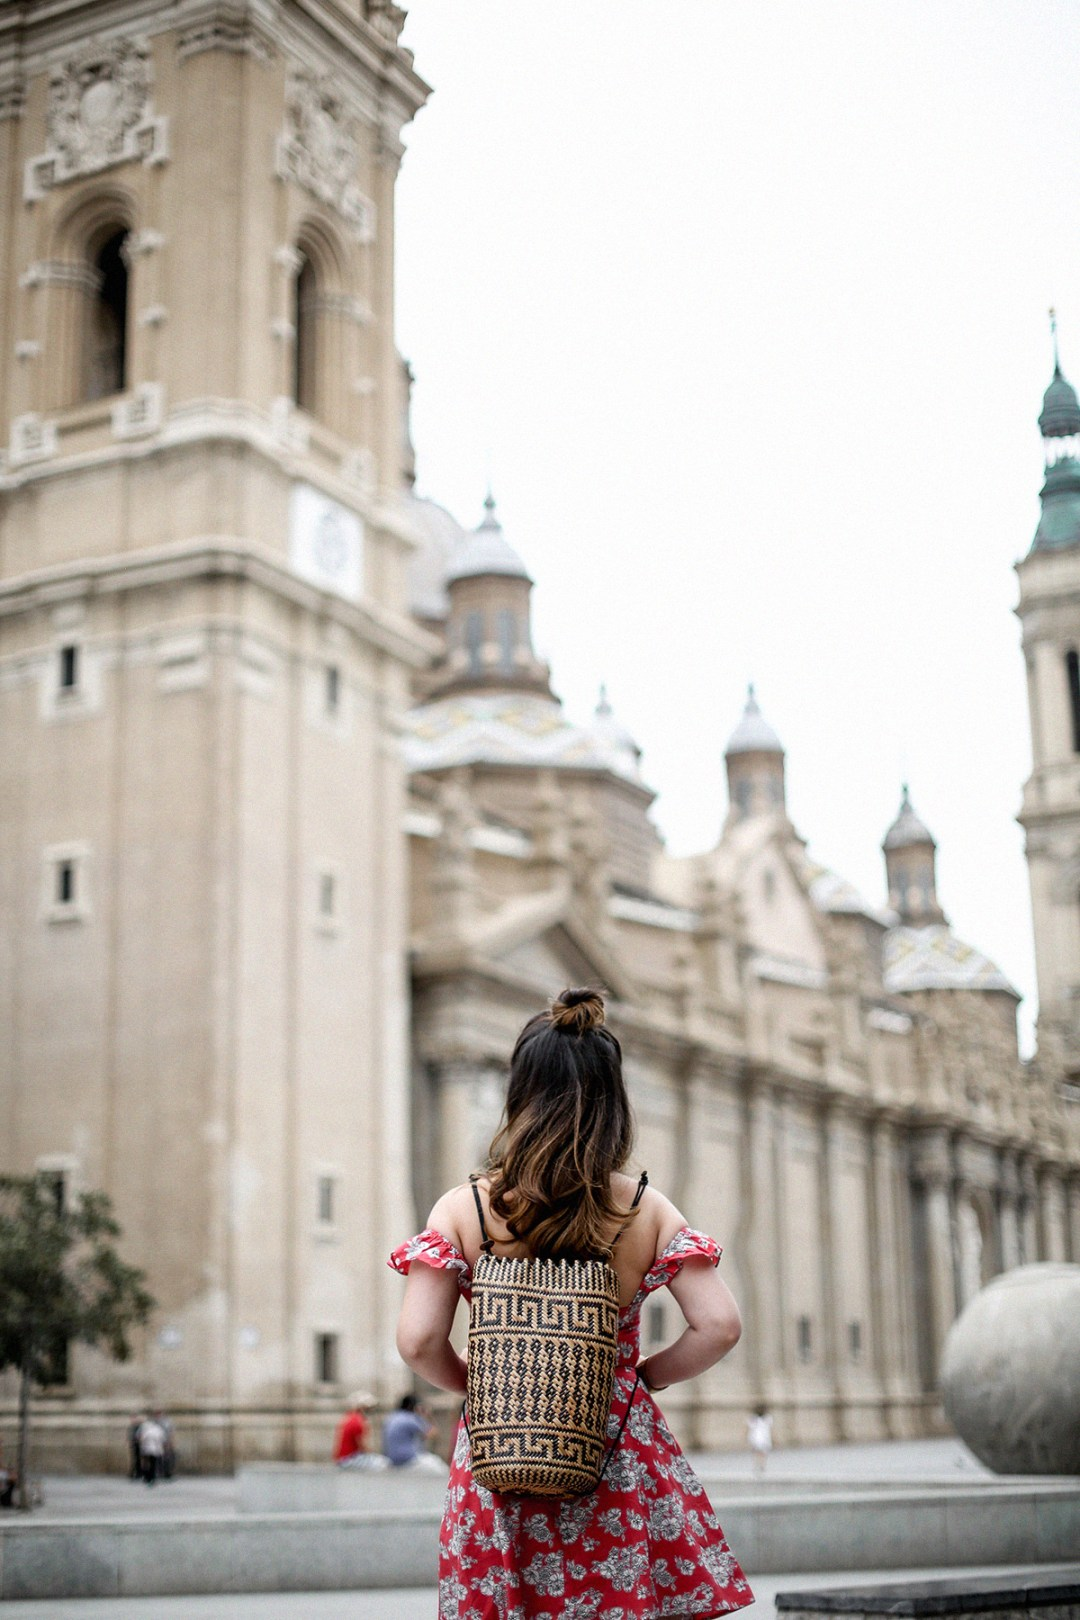 vestido-hombros-al-aire-asos-mochila-ratan-zaragoza-travel6